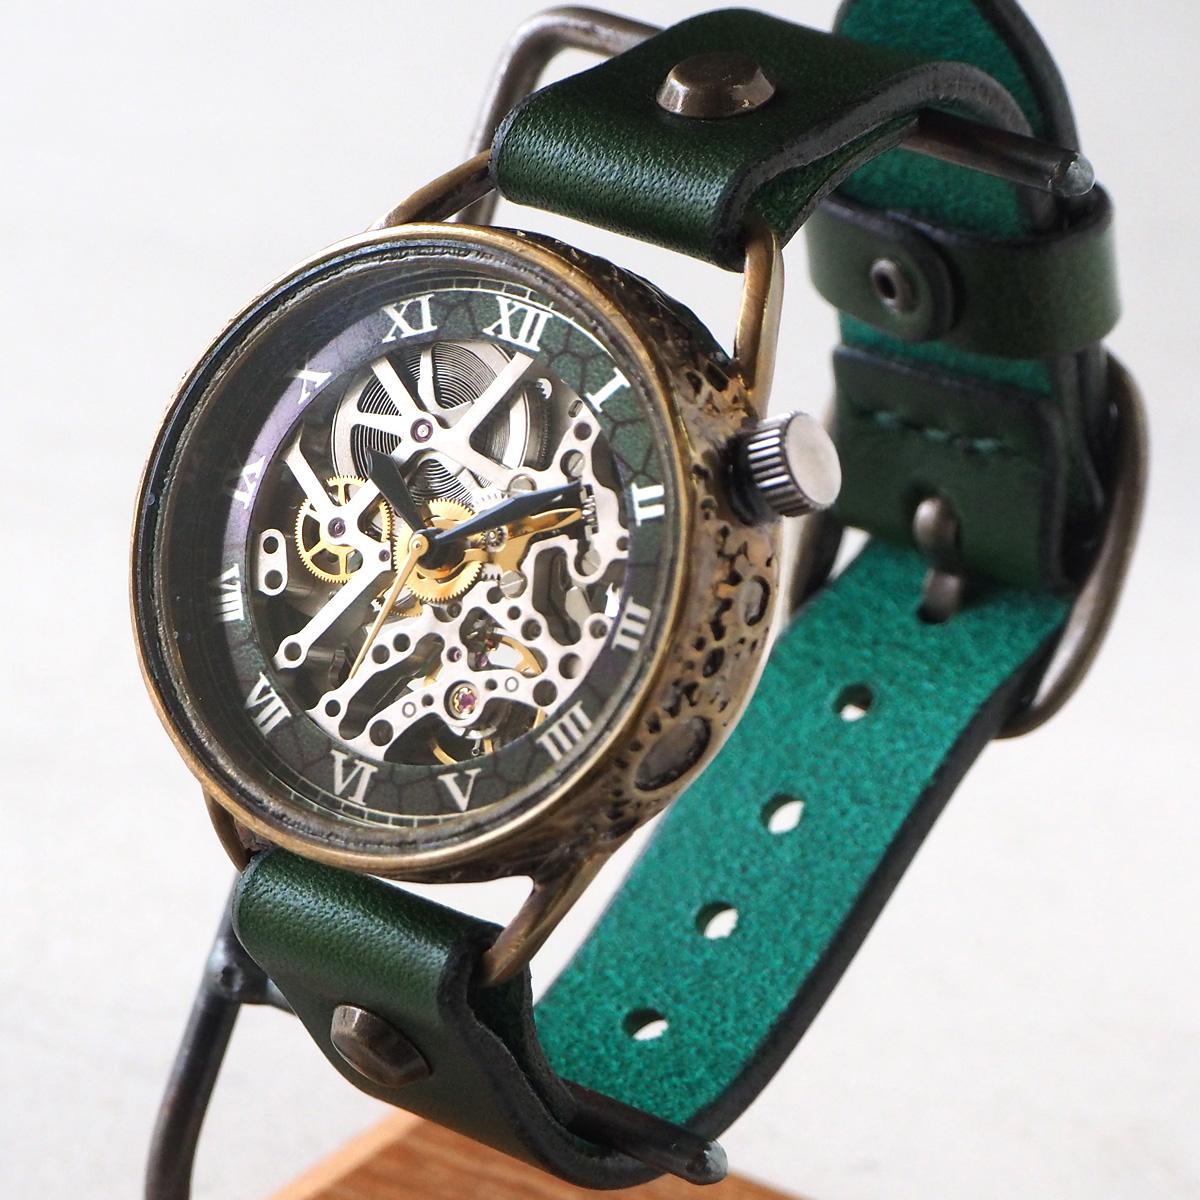 Product made in KINO (keno) handicraft watch self-winding watch back  skeleton mechanic silver green [K-15-MSV-GR] 時計作家木野内芳祐機械式腕時計 handmade watch